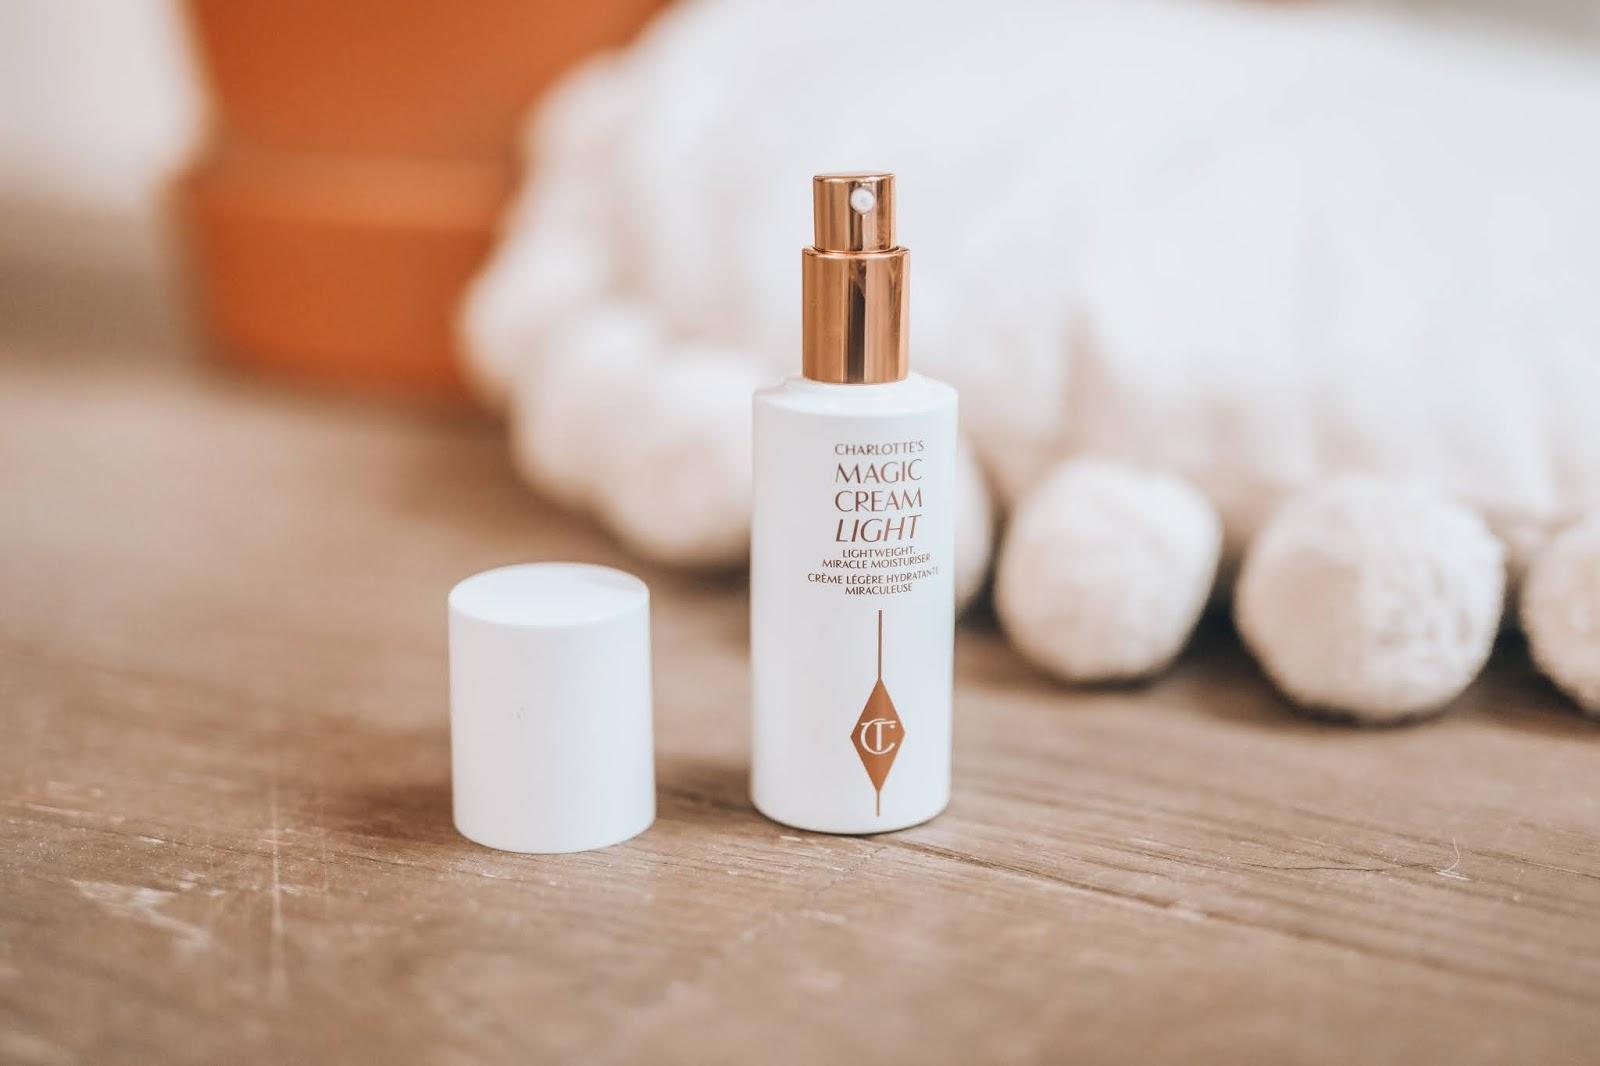 Charlotte tilbury magic cream light moisturiser